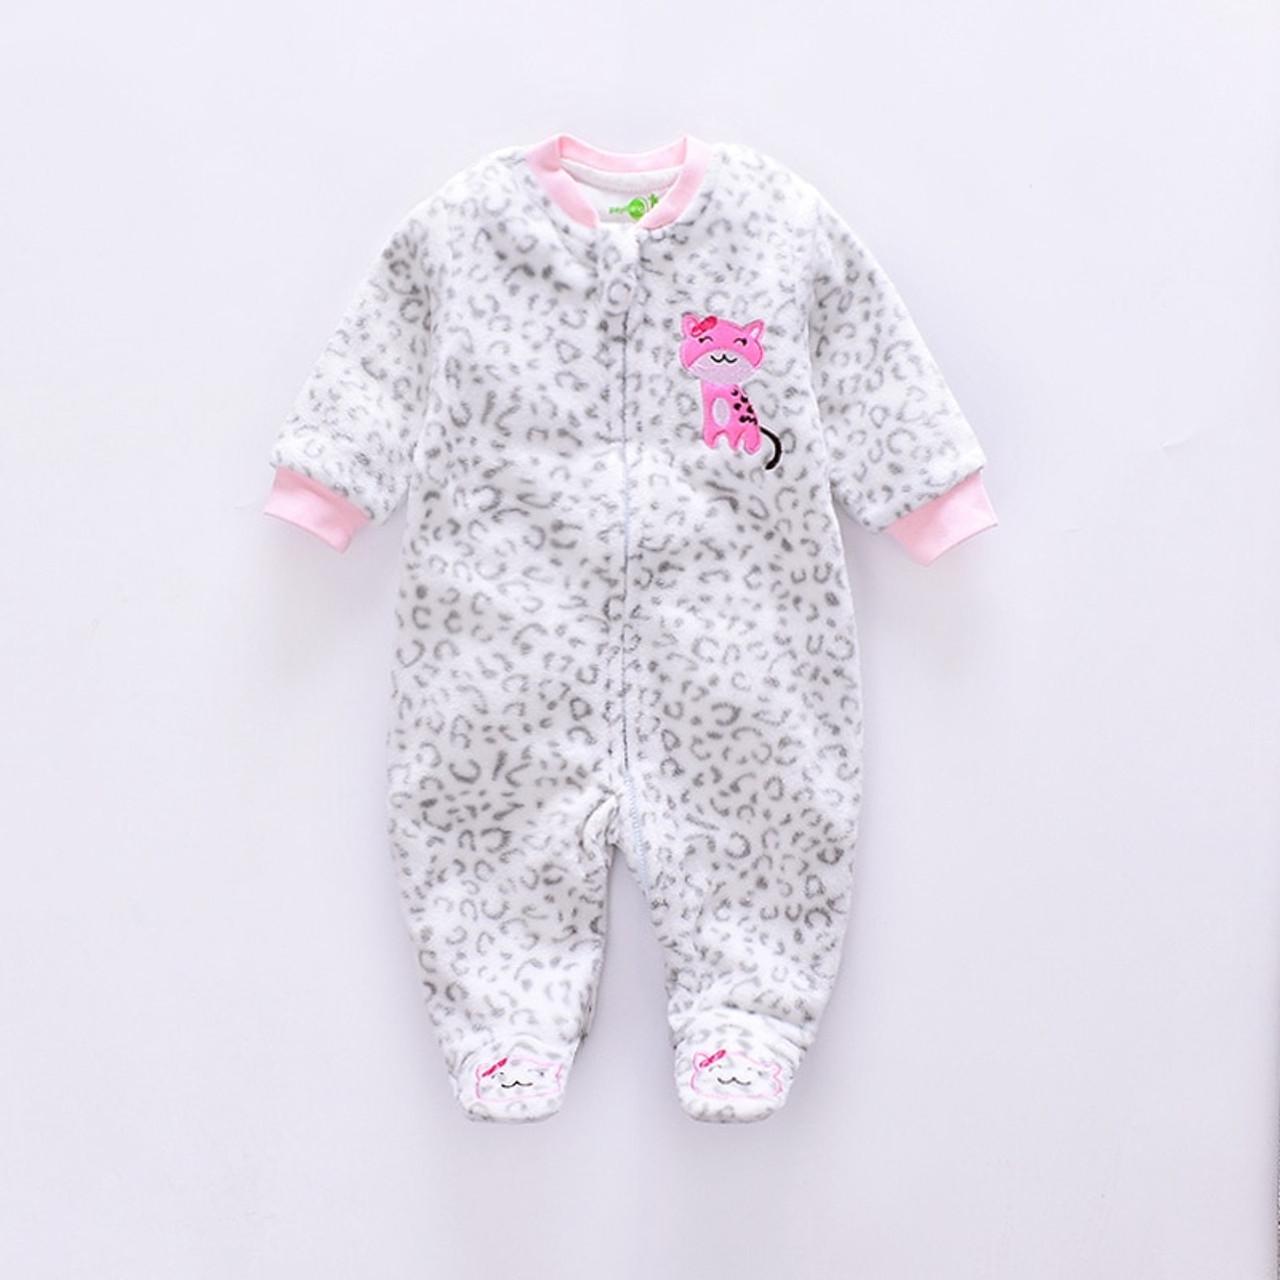 braeccesuit Jamaica Map Infant Baby Boys Girls Infant Creeper Sleeveless Onesie Romper Jumpsuit White